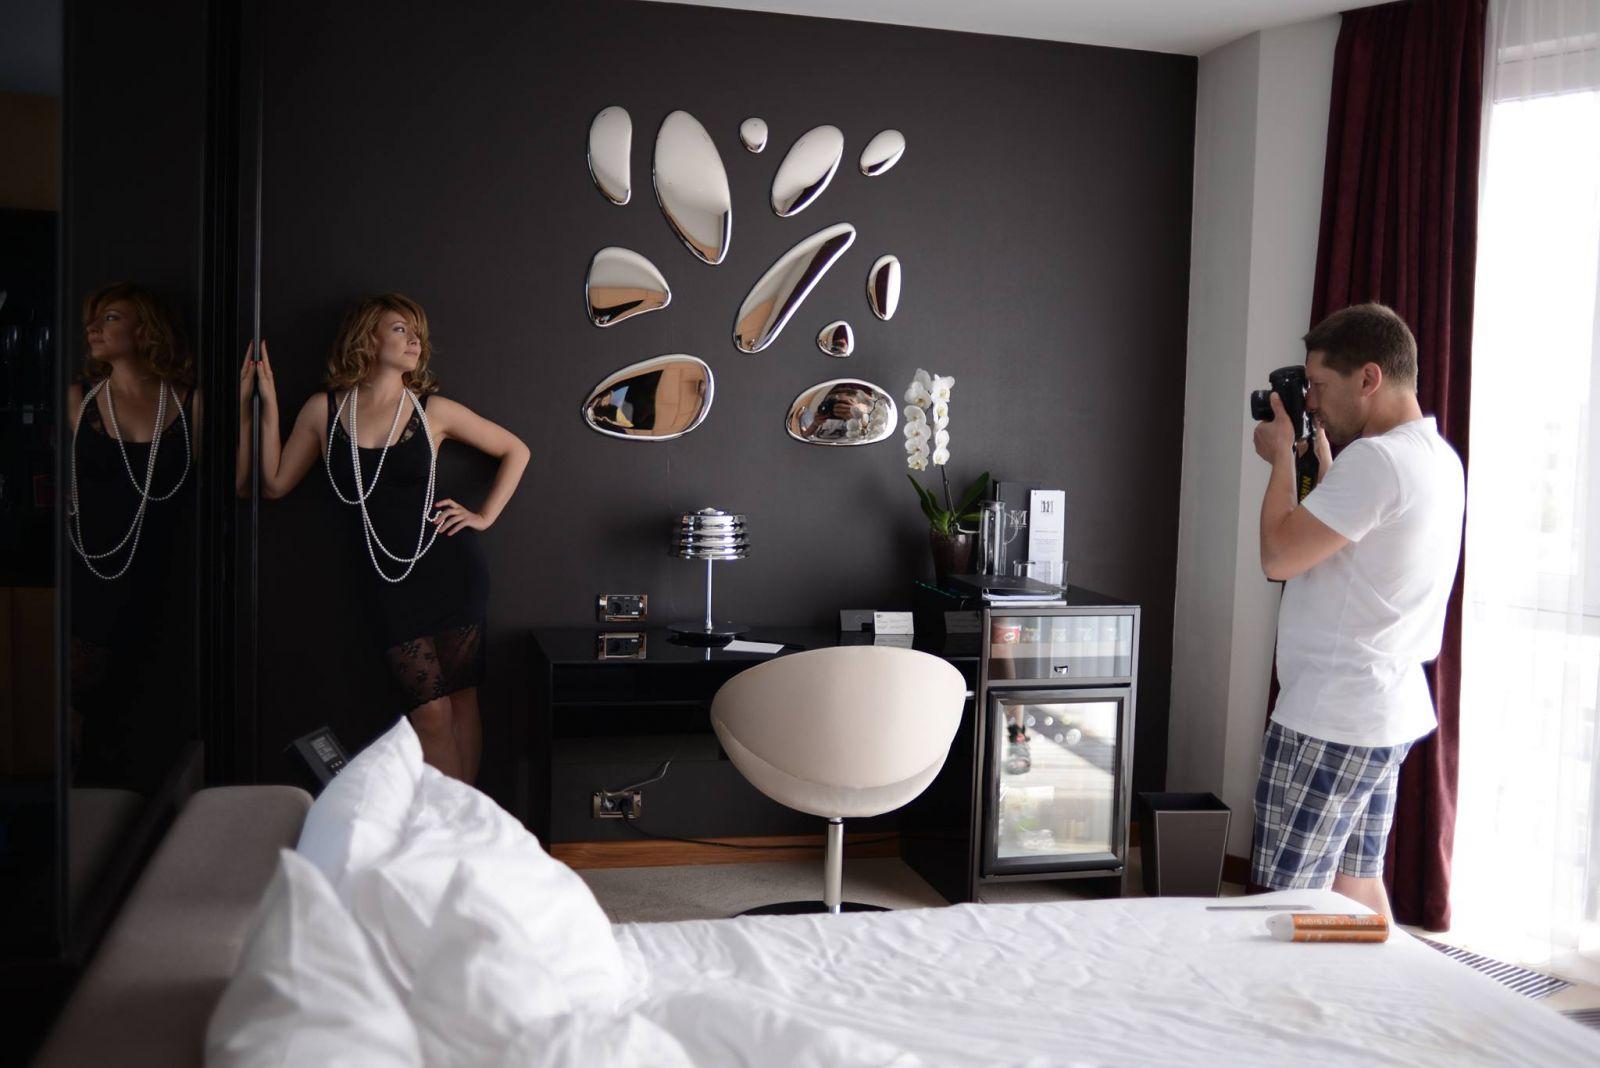 Как Елена Кравец из «Квартала 95» впервые разделась для глянца - фото №1